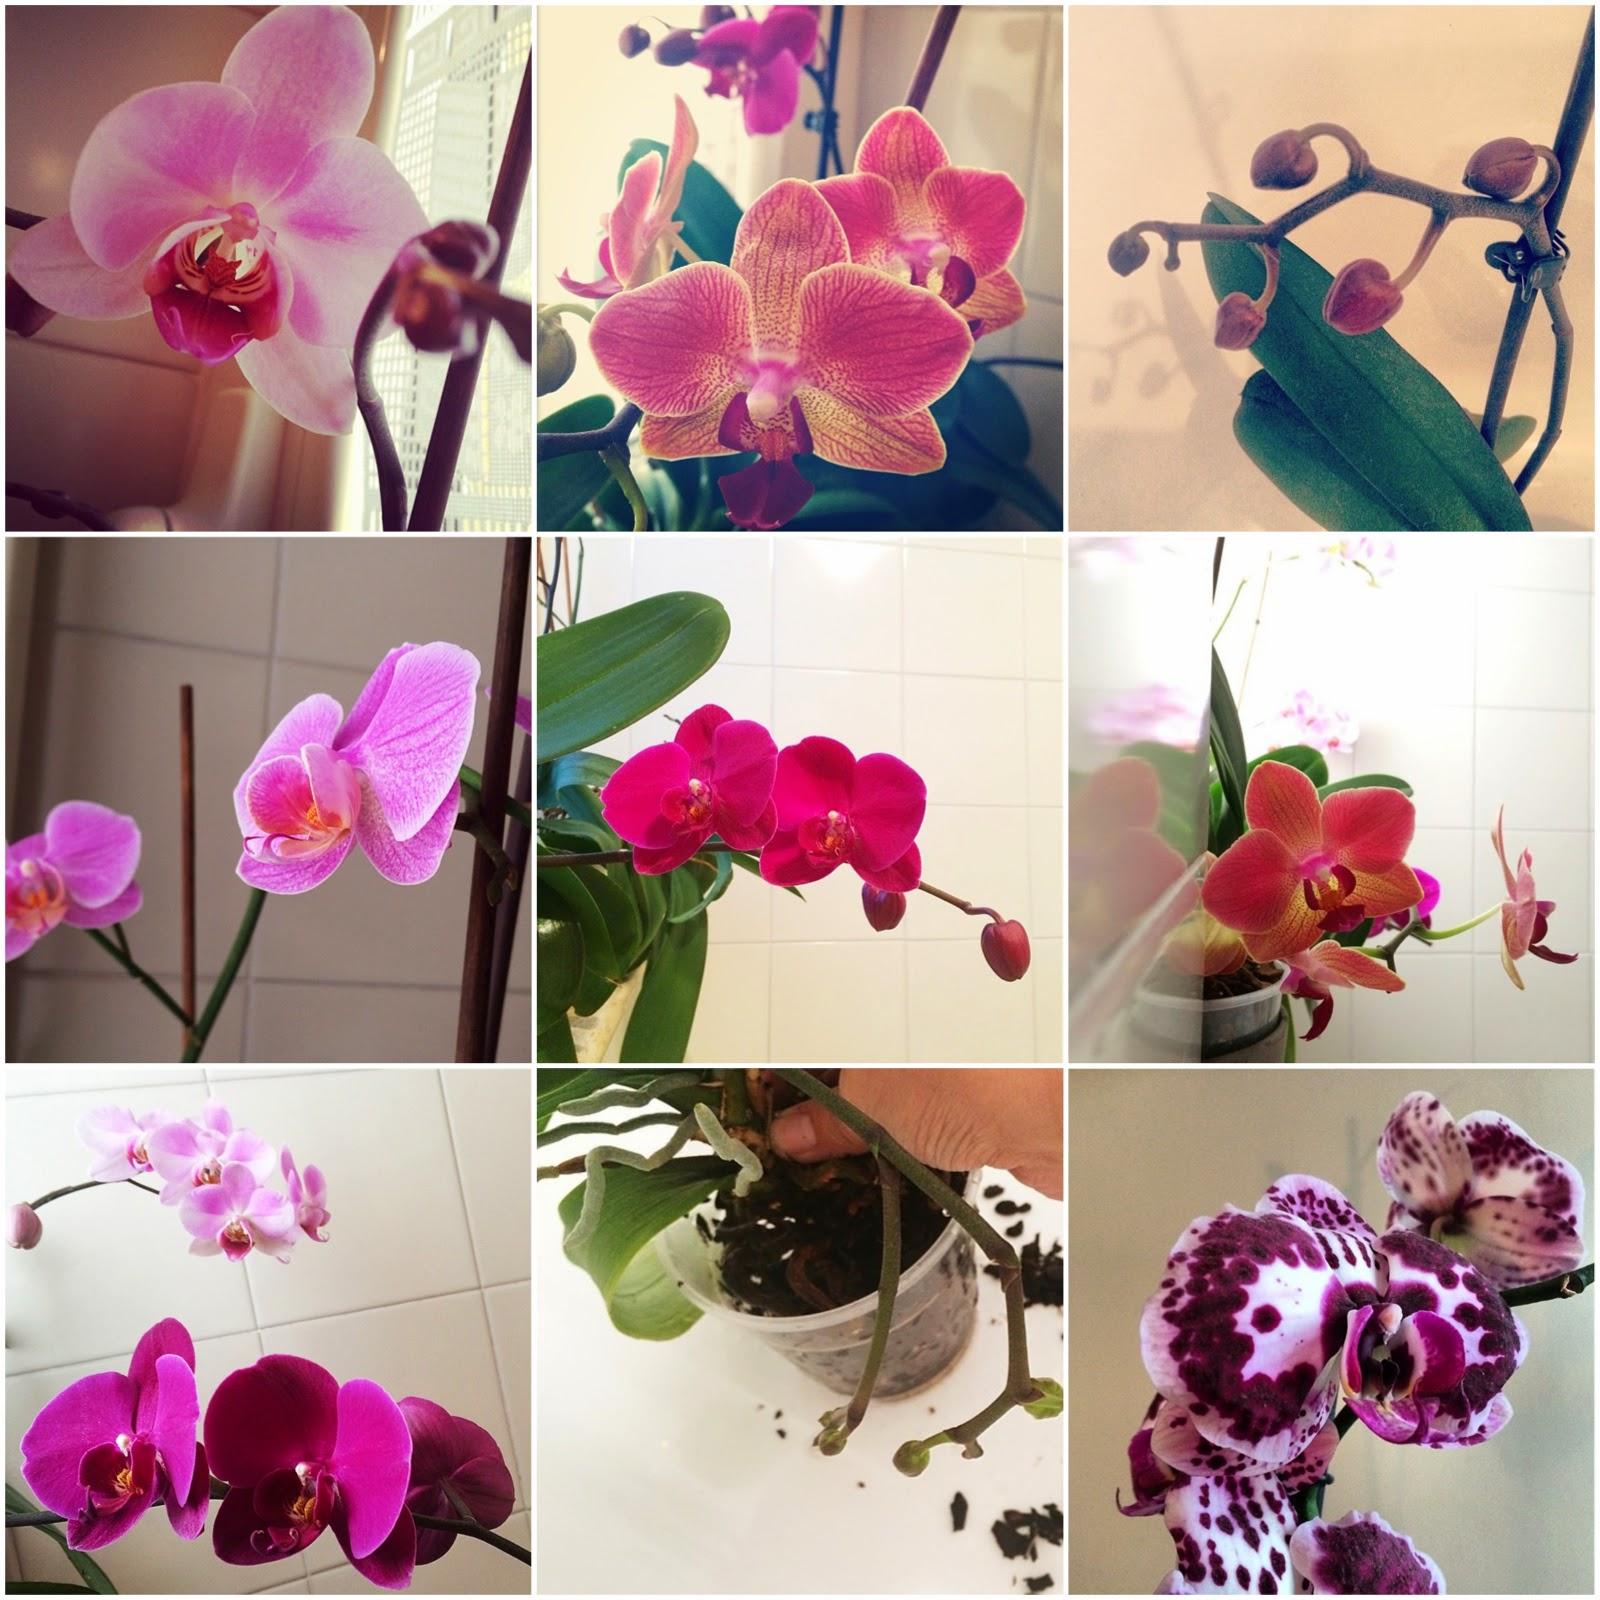 Vasi per orchidee ikea vasi per orchidee - Vasi per orchidee ...